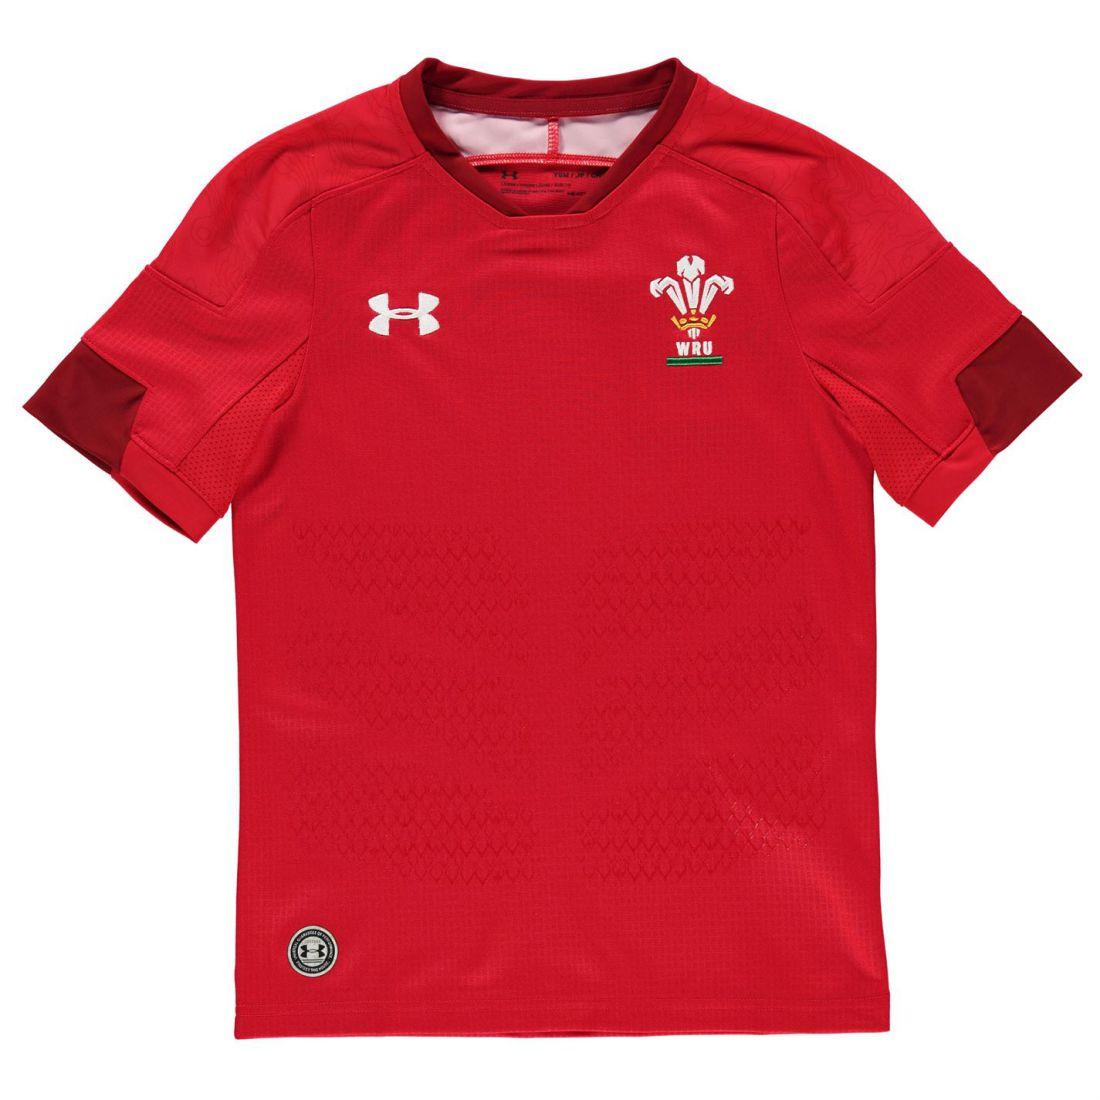 Under Armour Kids Wales Home Rugby Shirt 2017 2018 Junior Short Sleeve HeatGear